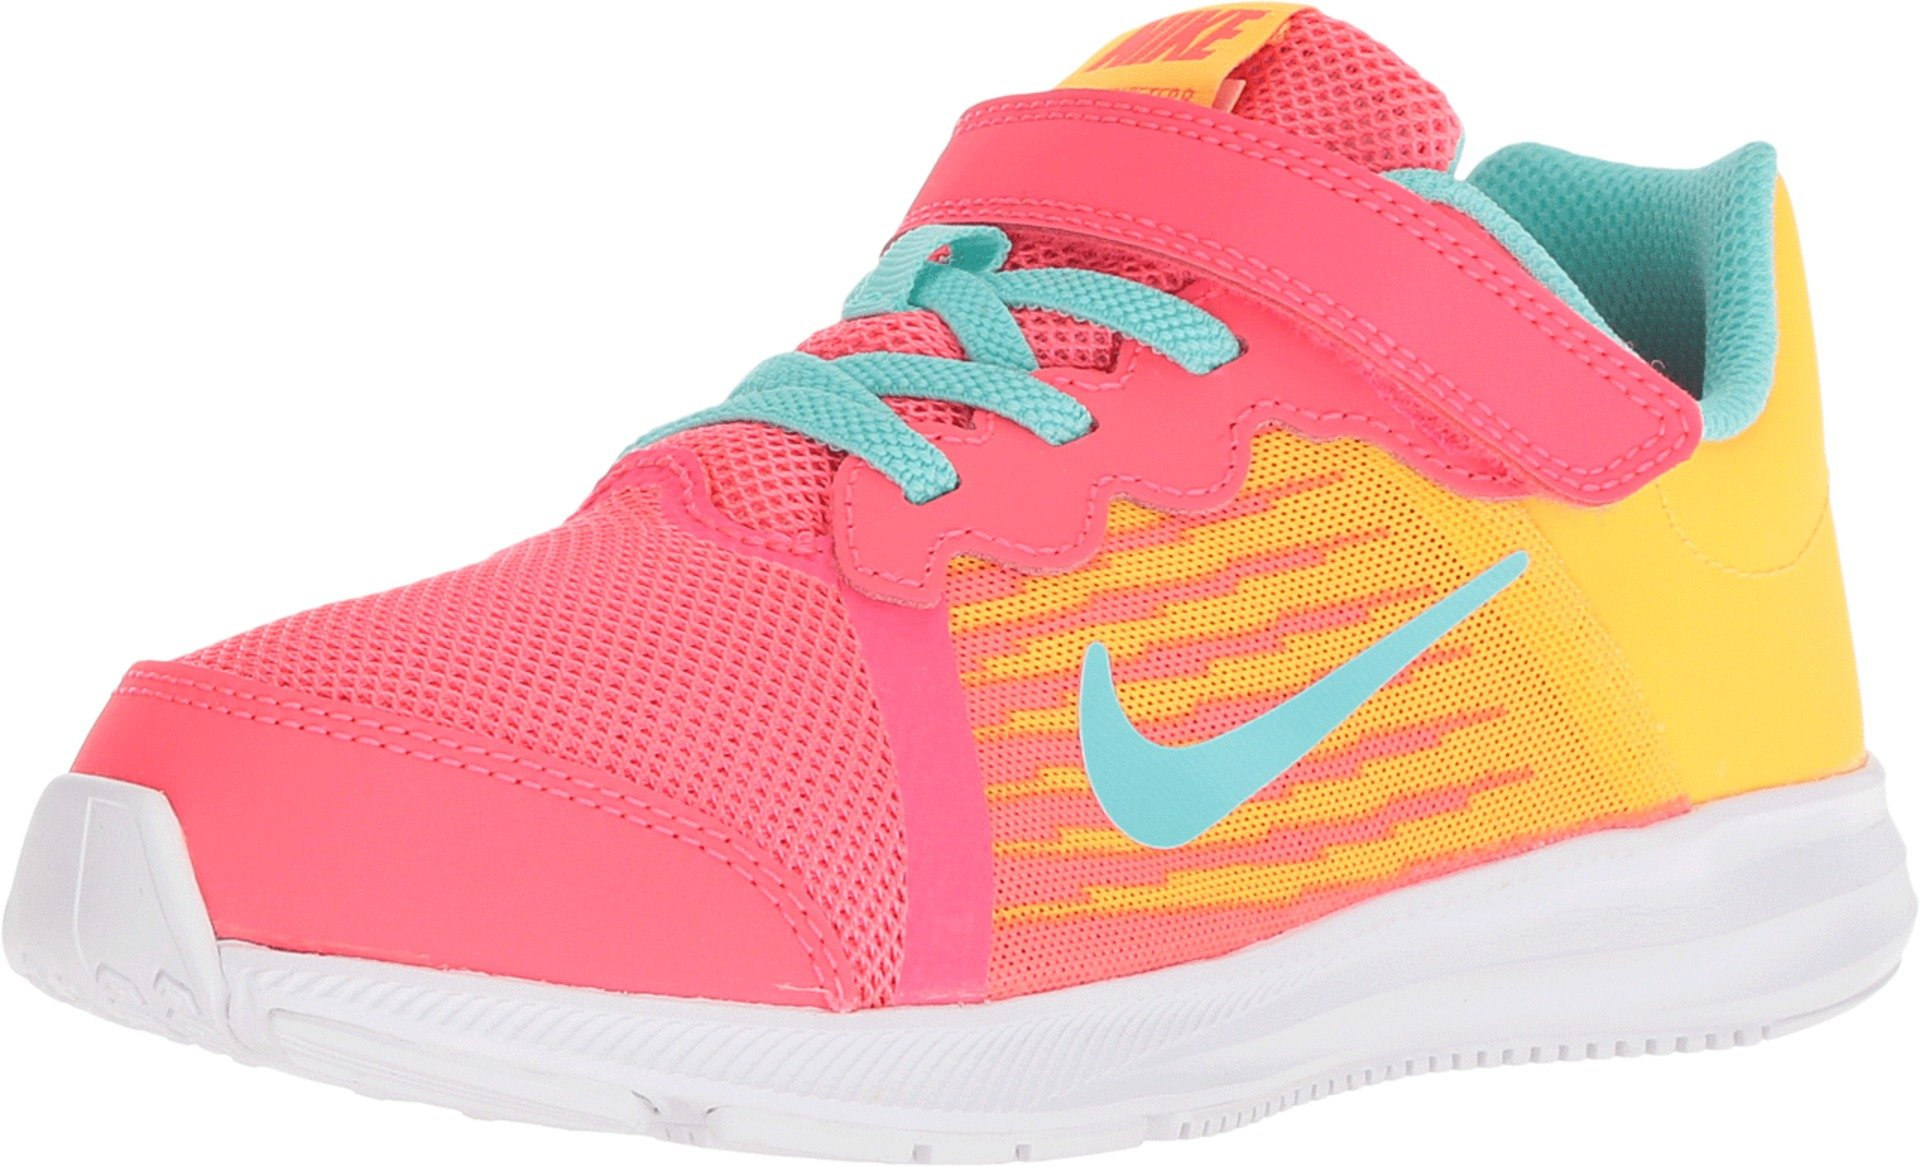 Nike Kids' Preschool Downshifter 8 Fade Running Shoes (1.5, Red/Green)